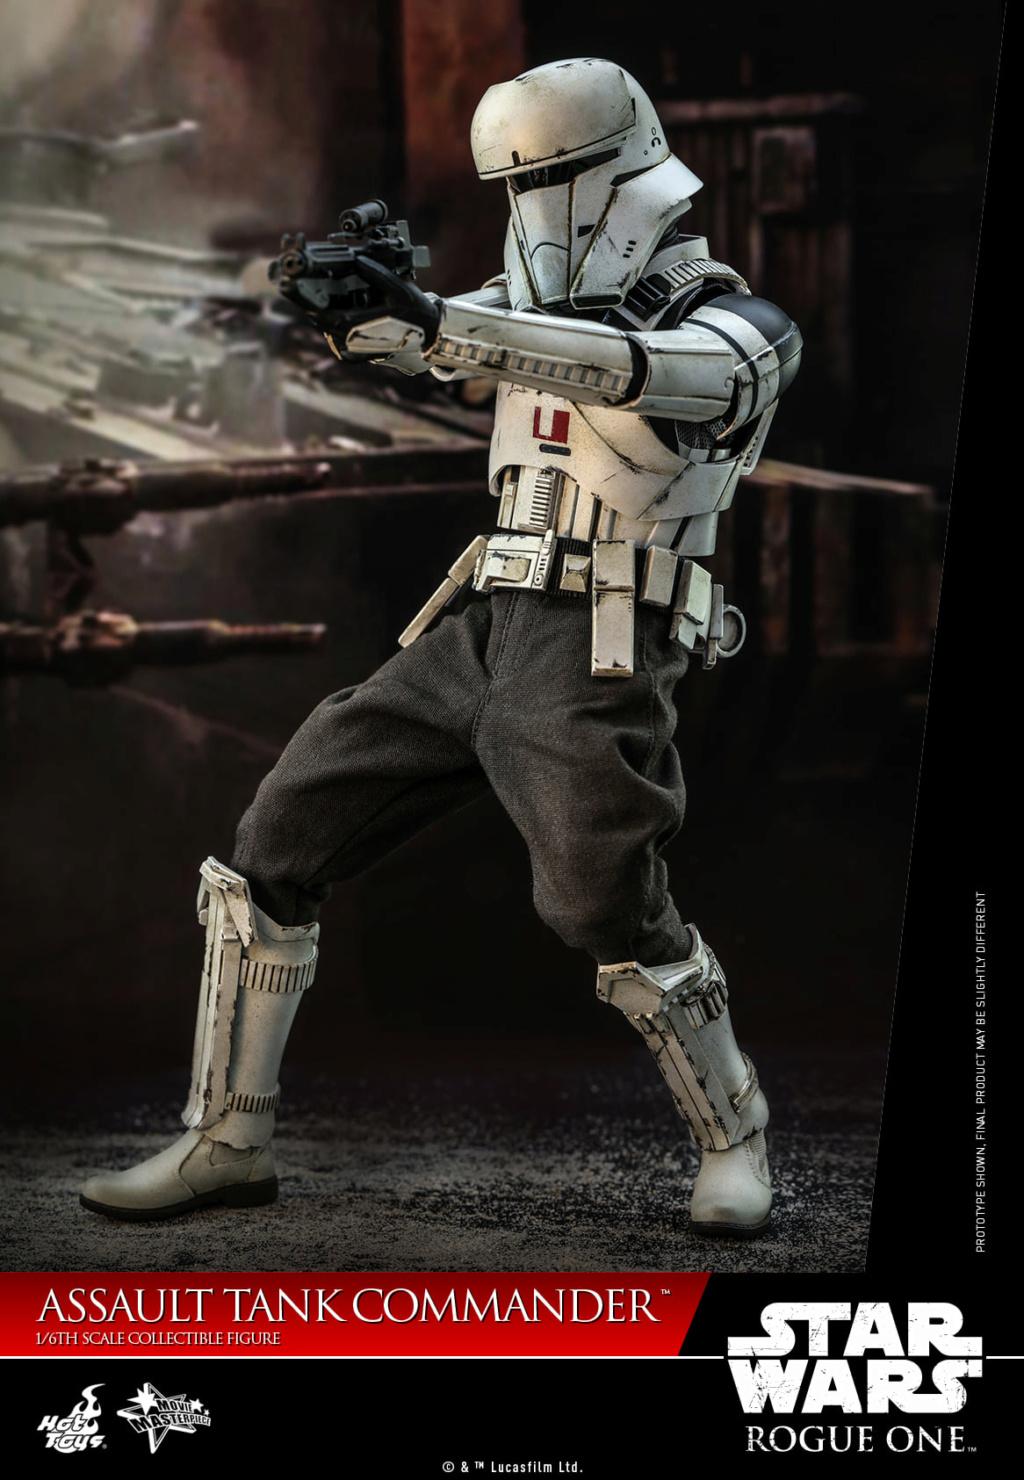 Assault Tank Commander - 1/6th scale - Hot Toys Assaul17